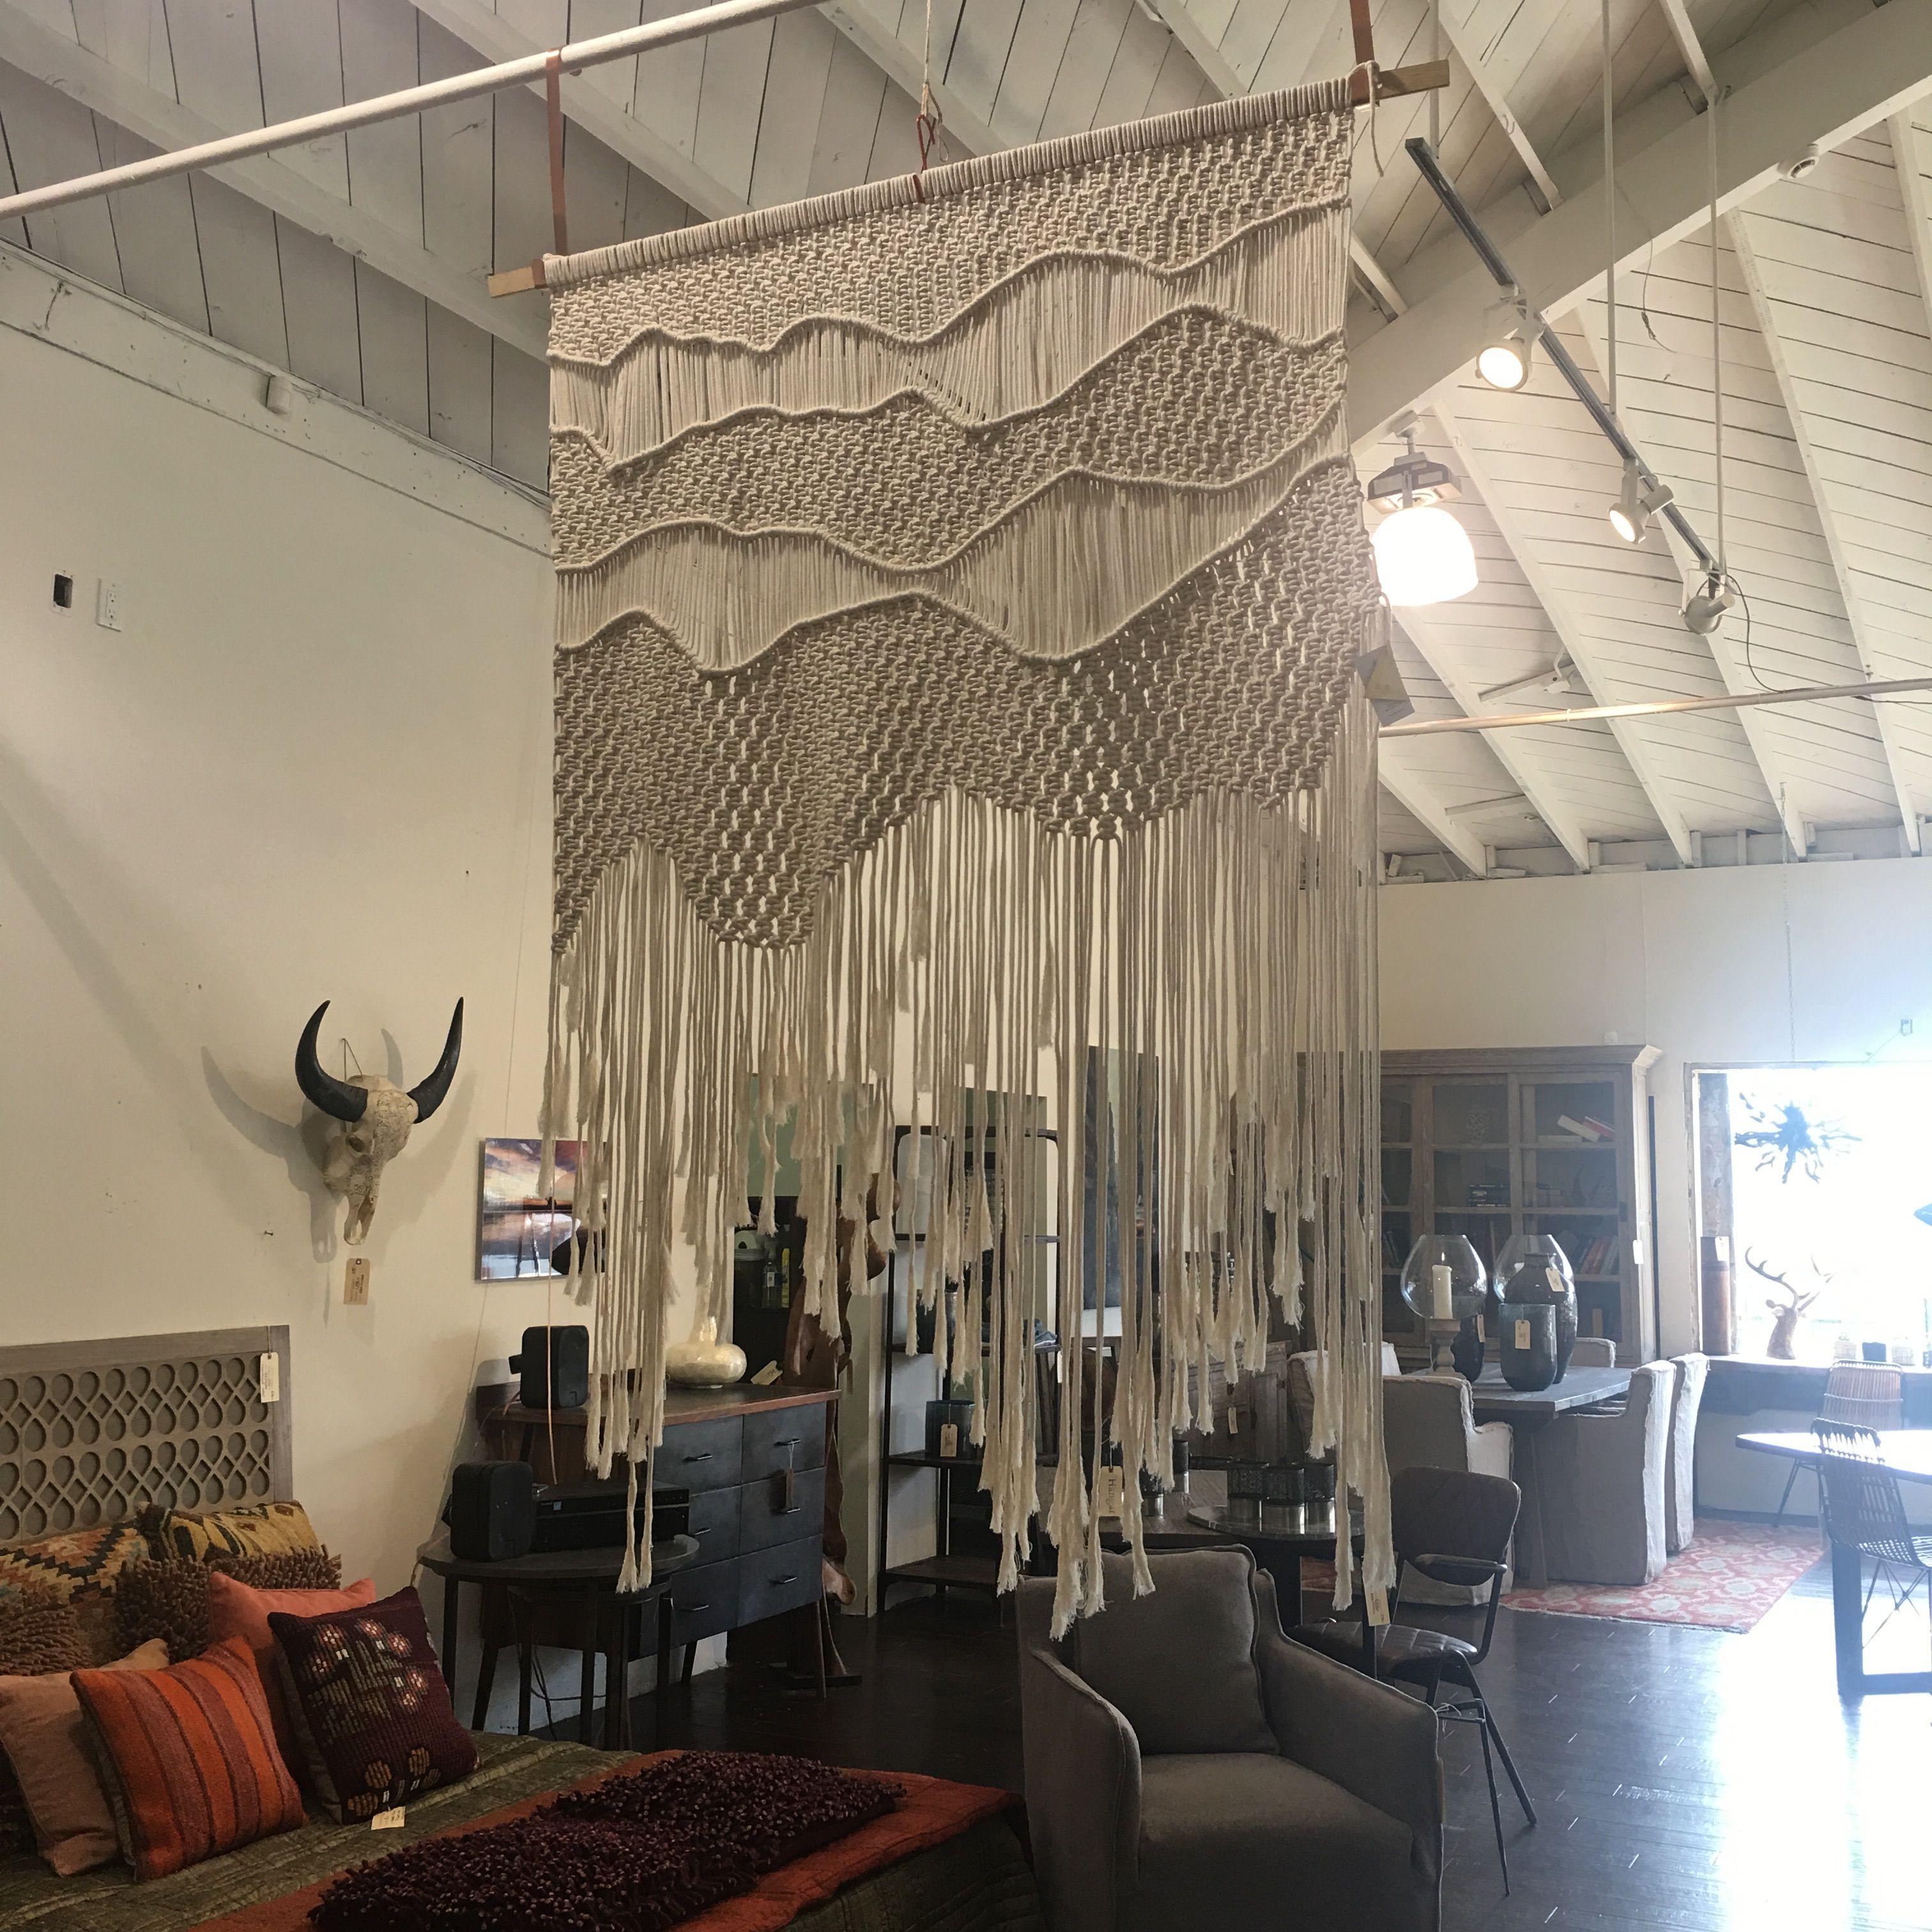 Macrame Wall Hanging, Macrame Diy, Handmade, Macrame Plant Hanger, Natural